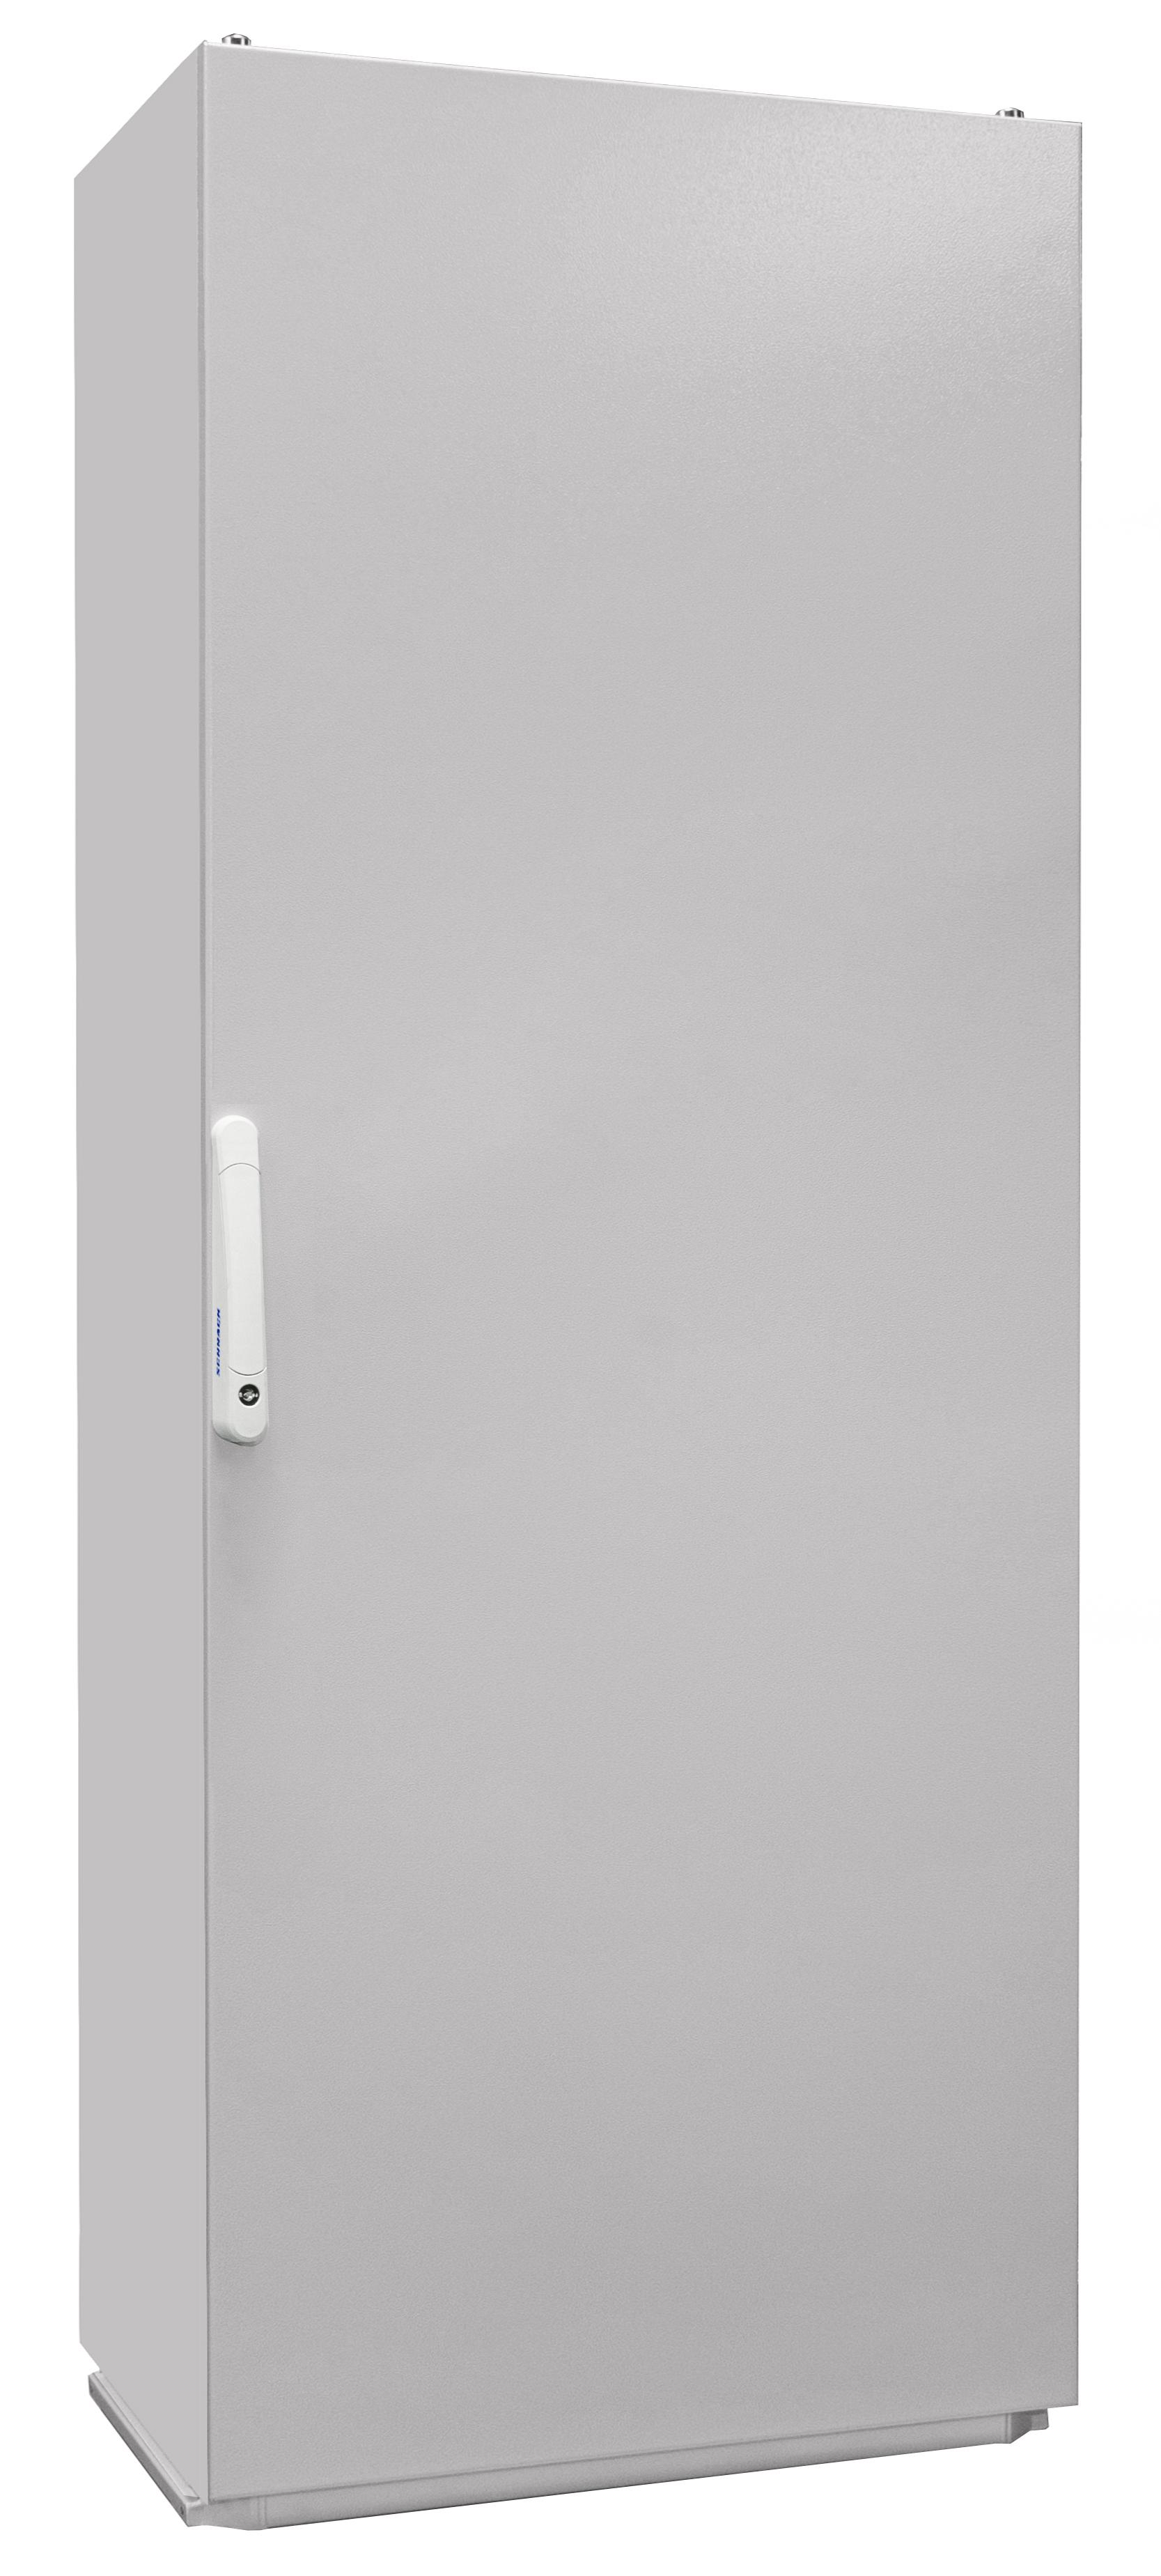 1 Stk Kompaktschrank 1-Tür IP55 H=2000 B=800 T=400mm Stahlblech KC208040--